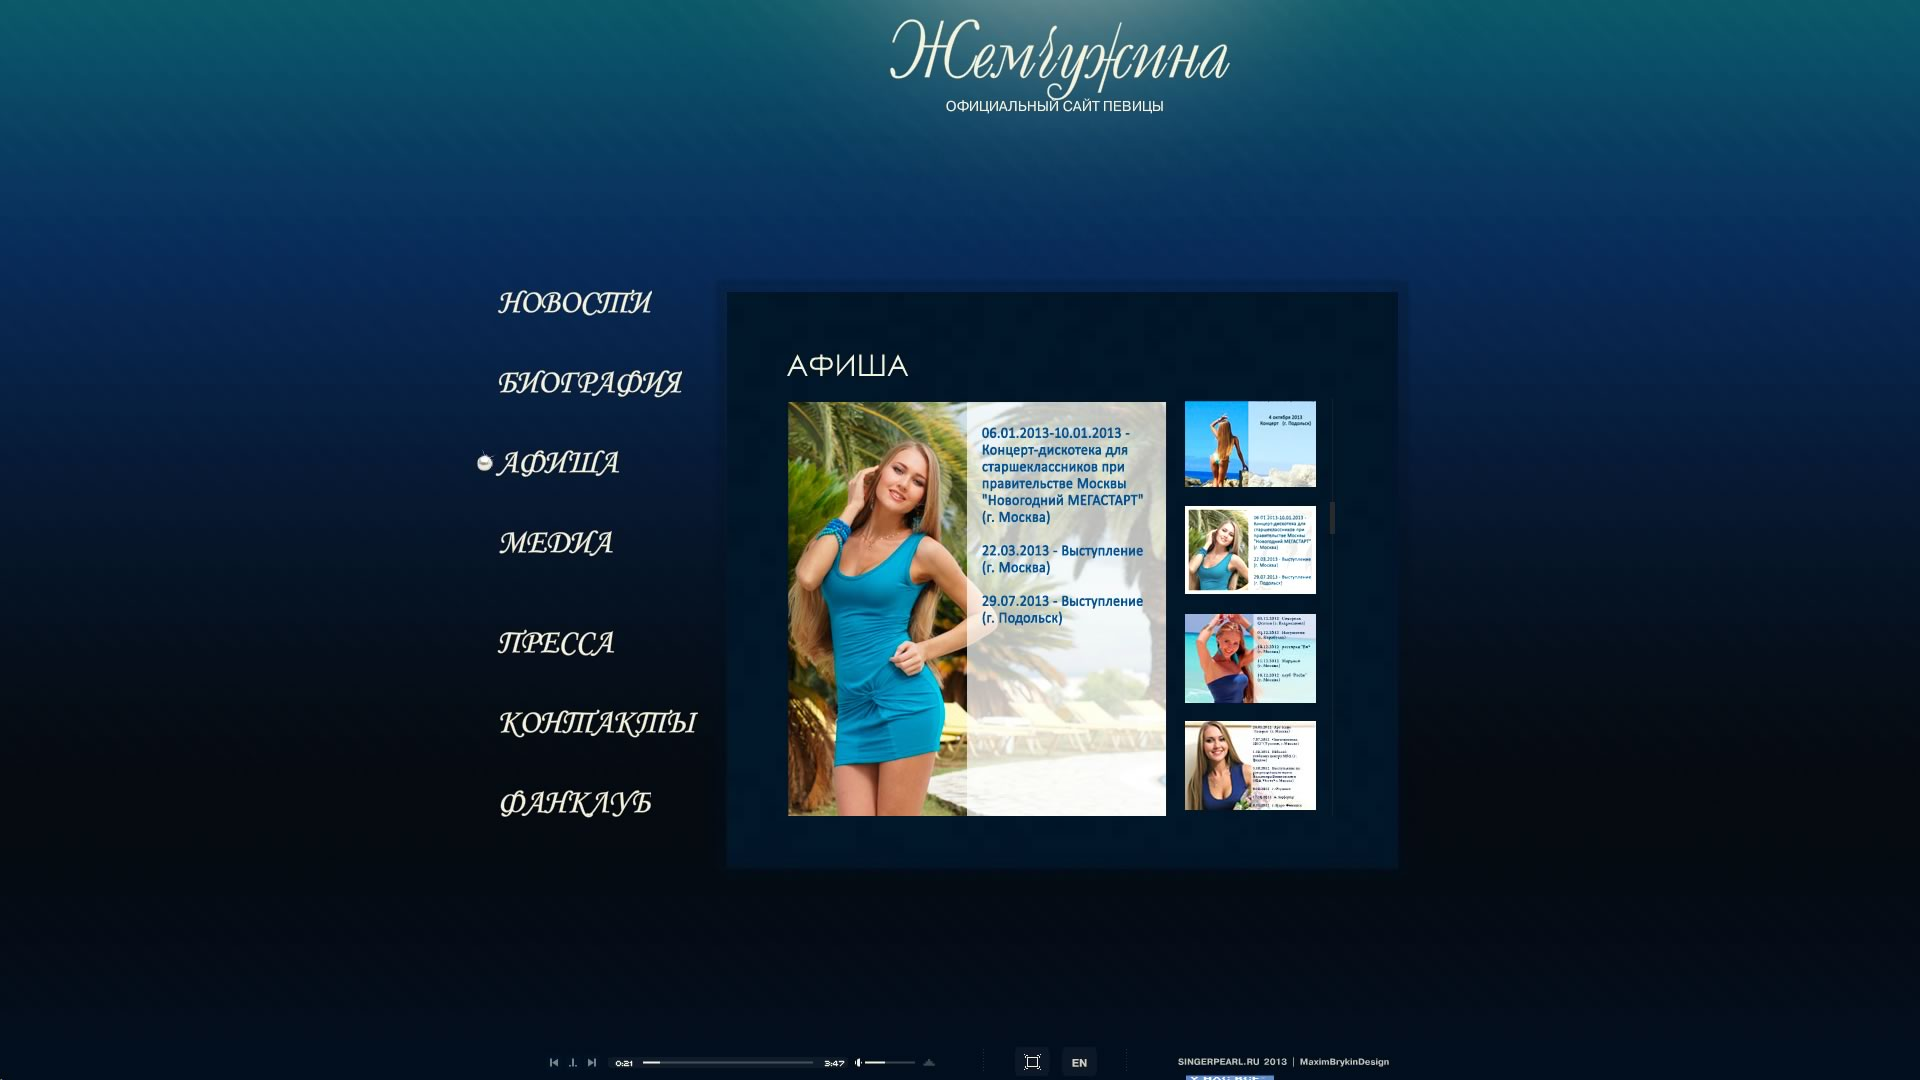 Создание сайта singerpearl.ru (flash) (5)